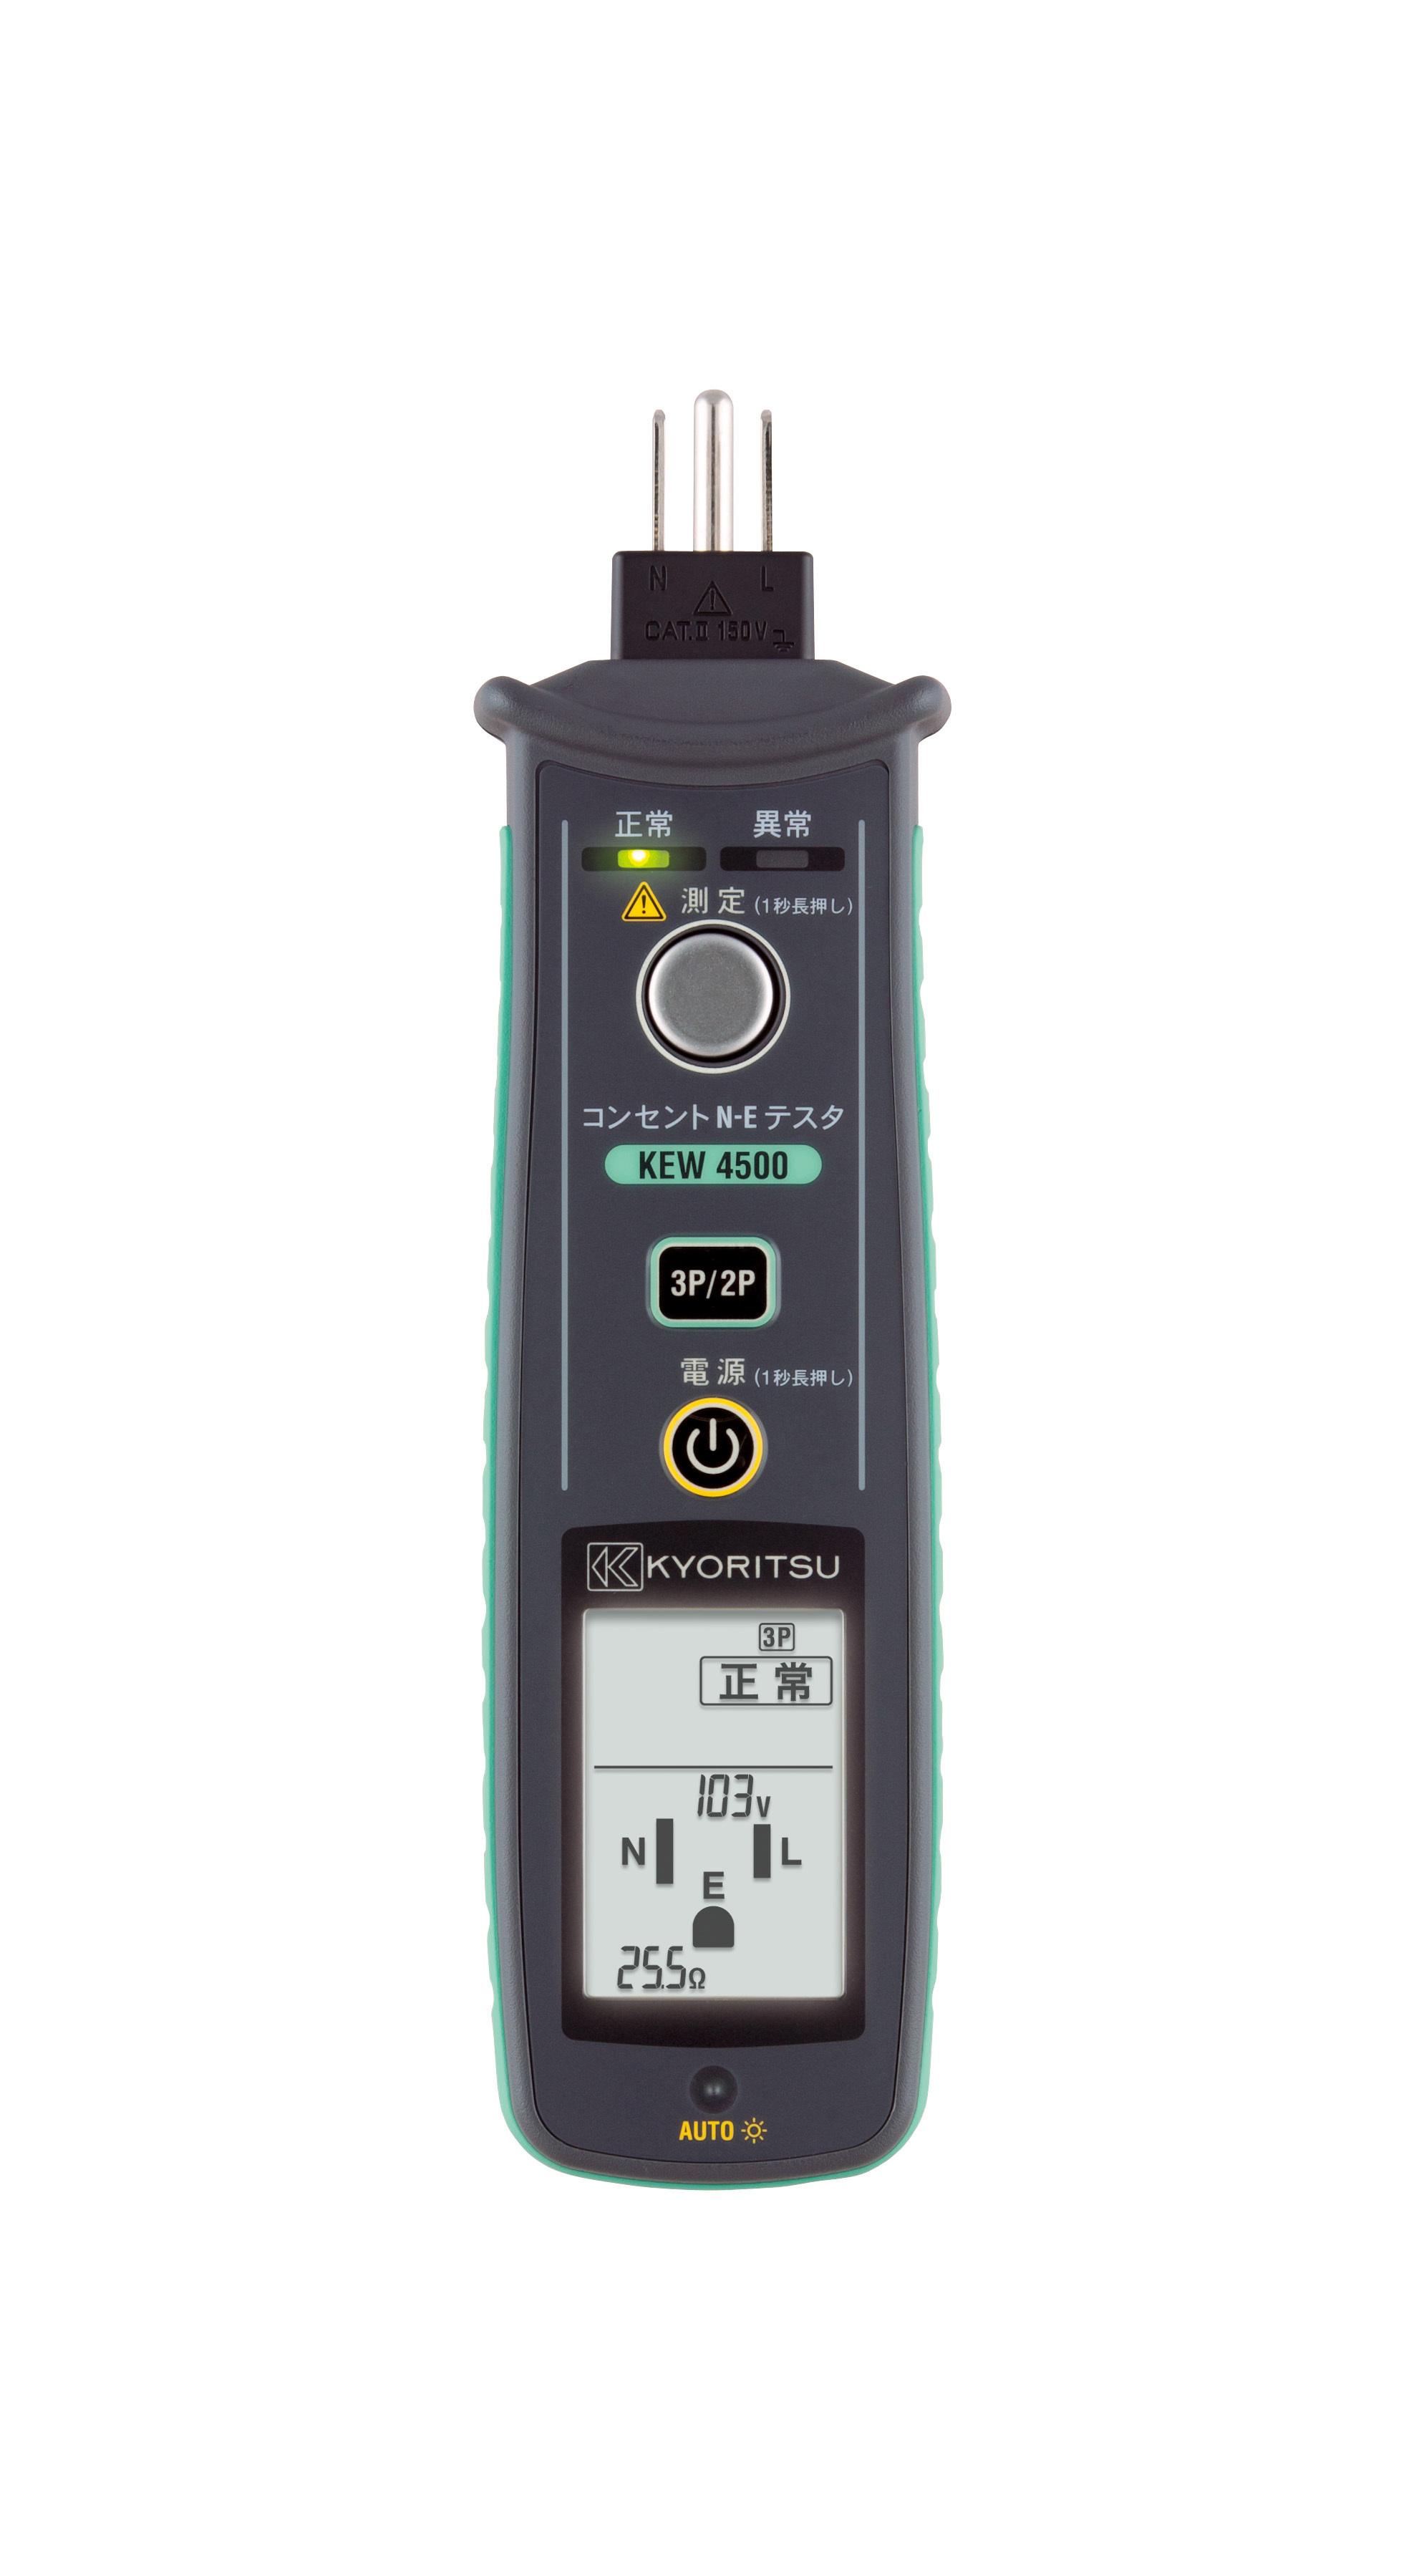 Info Harga Digital Insulation Tester 50v 100v 250v 500v Kyoritsu Police 14639jsrbl 02 Coklat Rosegold Ring Biru 3022 N E